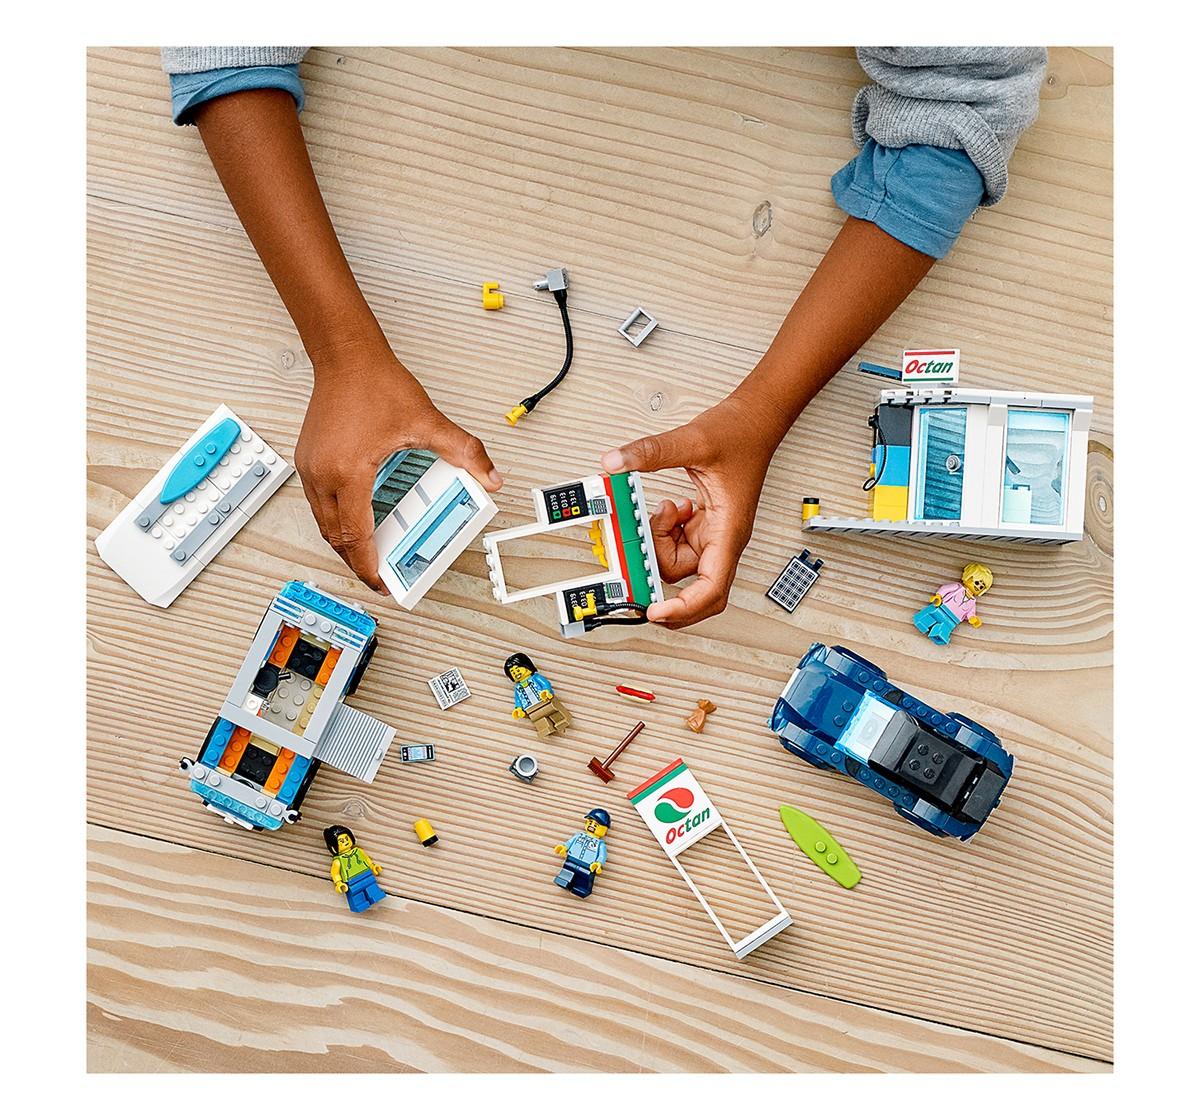 LEGO 60257 Service Station Lego Blocks for Kids age 5Y+